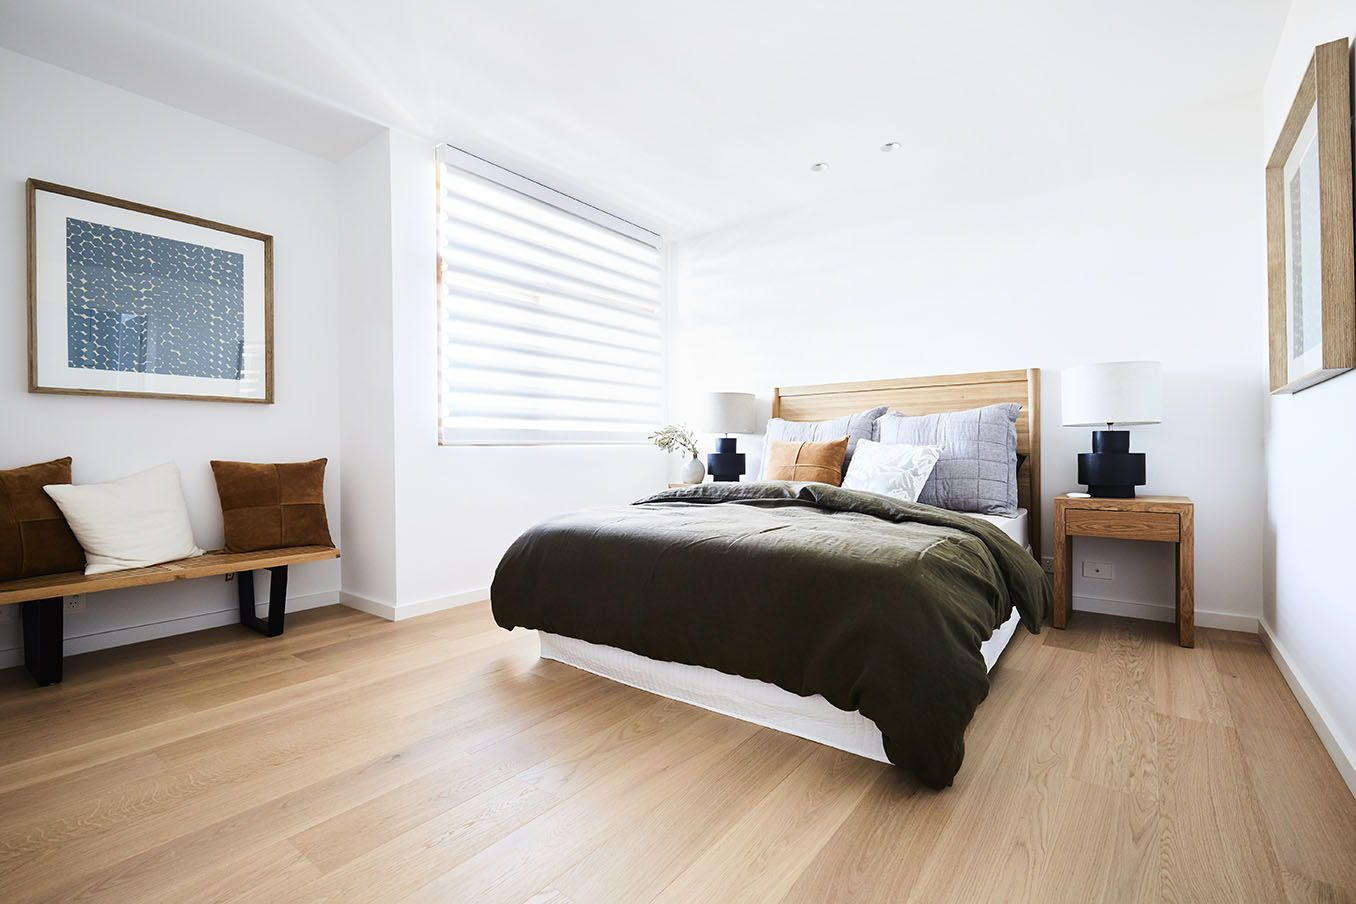 10 BEDROOM flooring inspiration ideas  bedroom flooring, perfect